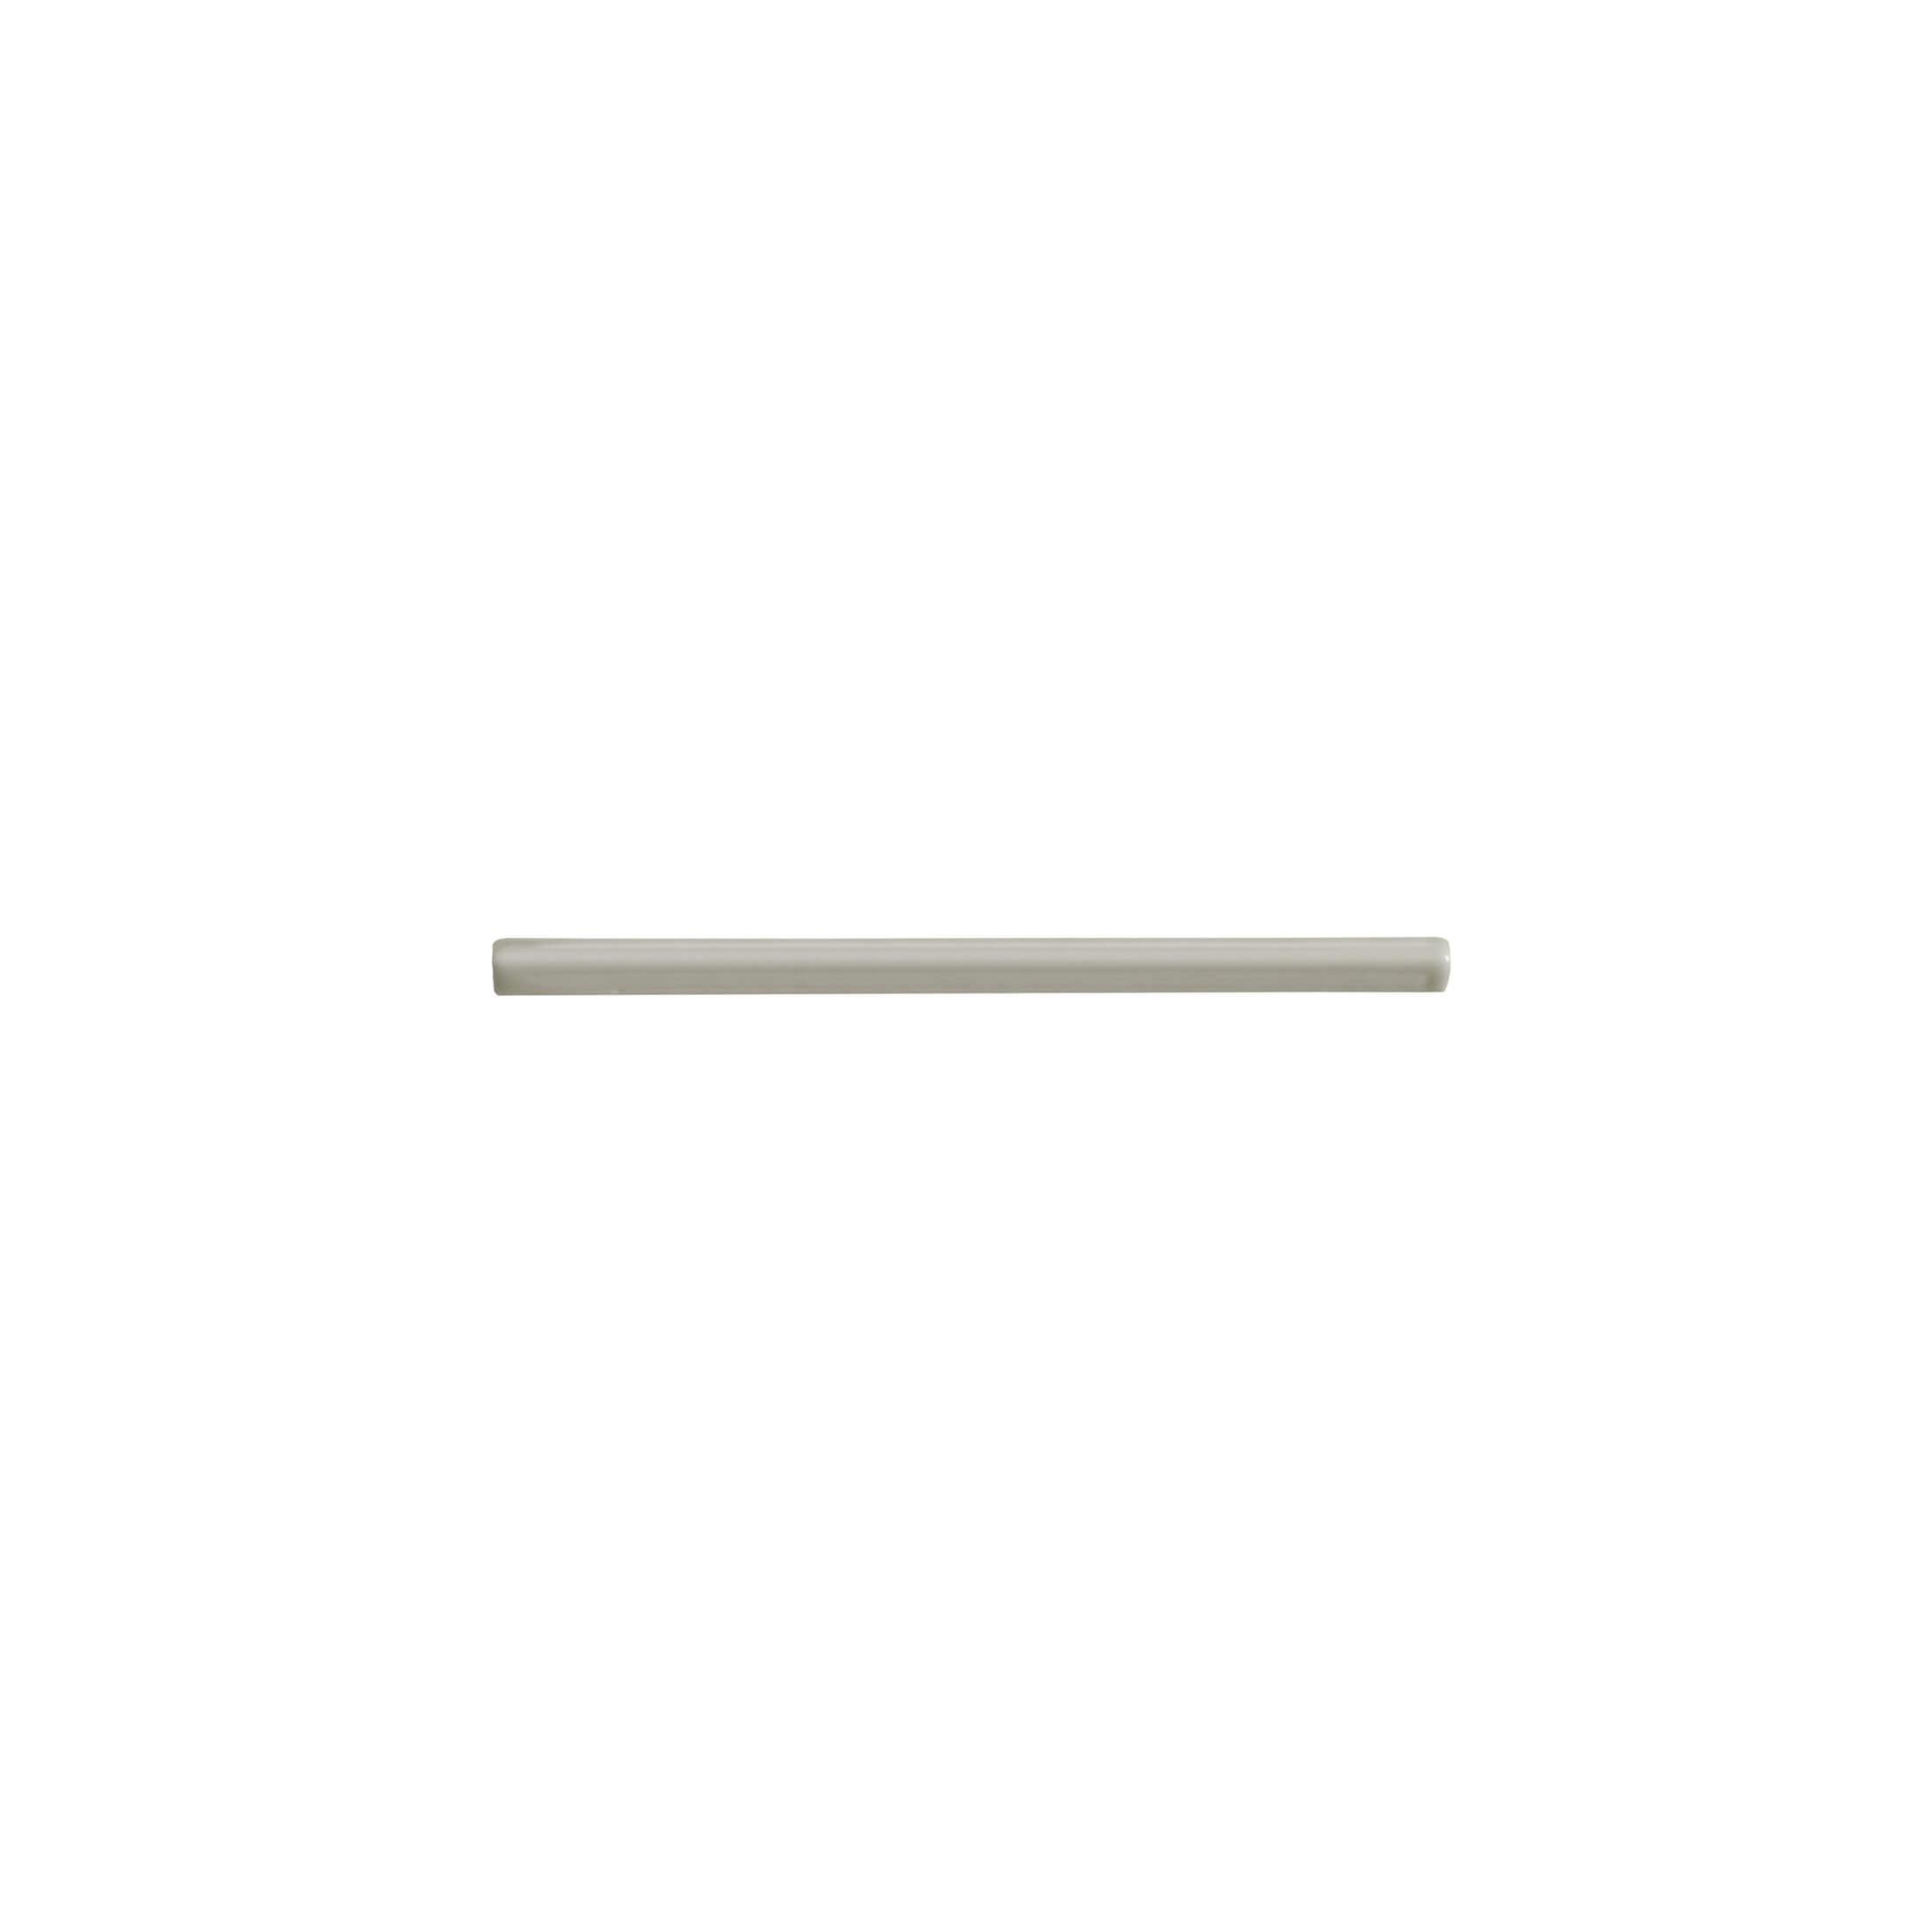 ADNE5585 - BULLNOSE TRIM - 0.85 cm X 15 cm